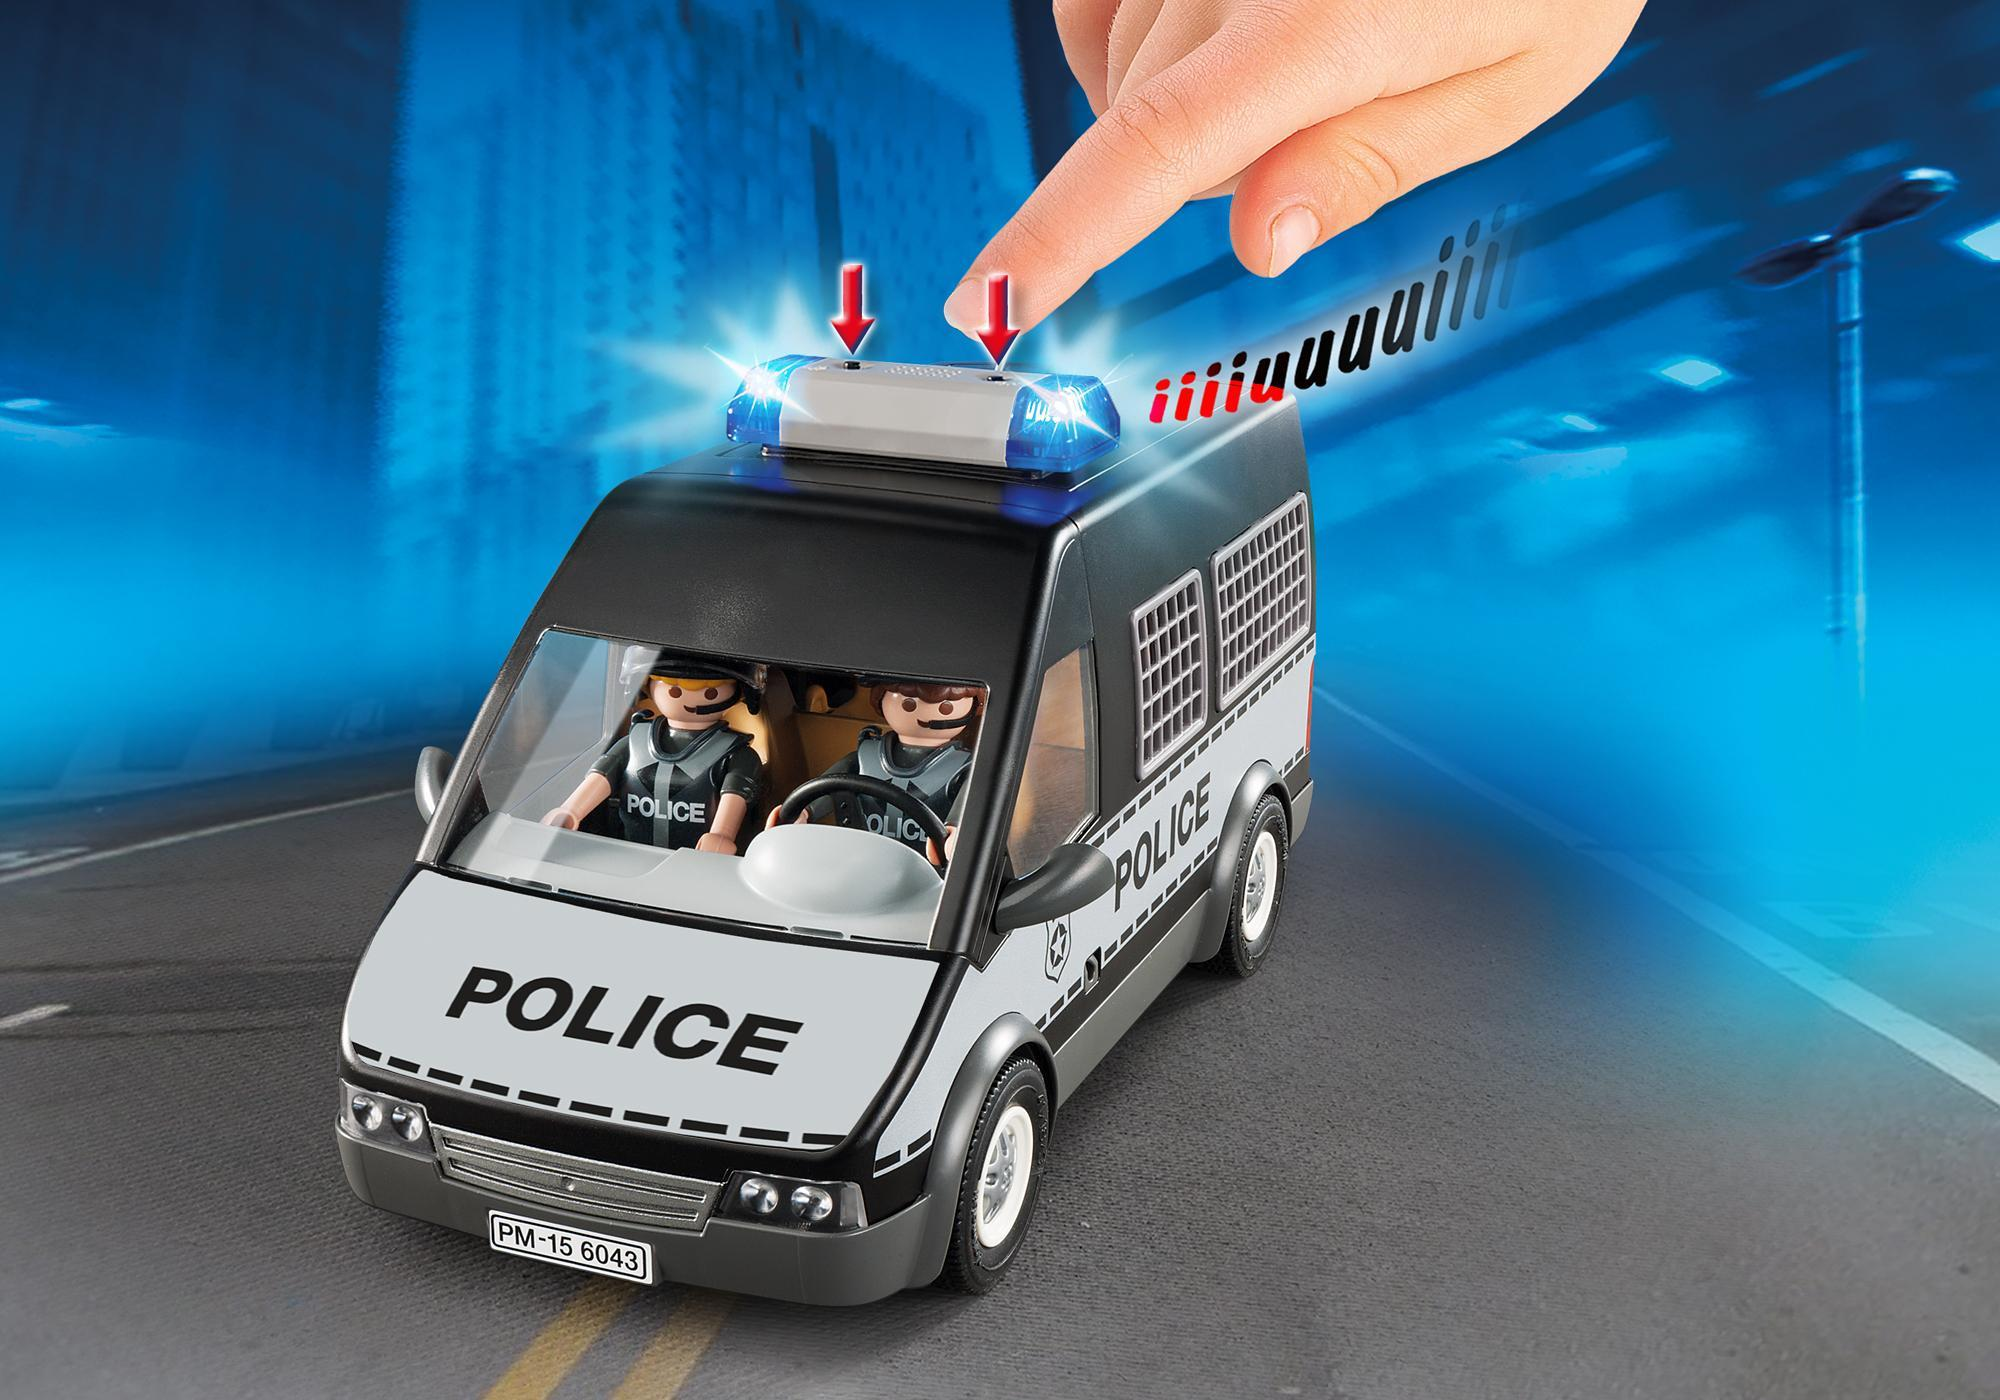 http://media.playmobil.com/i/playmobil/6043_product_extra1/Furgón de Policía con Luces y Sonido